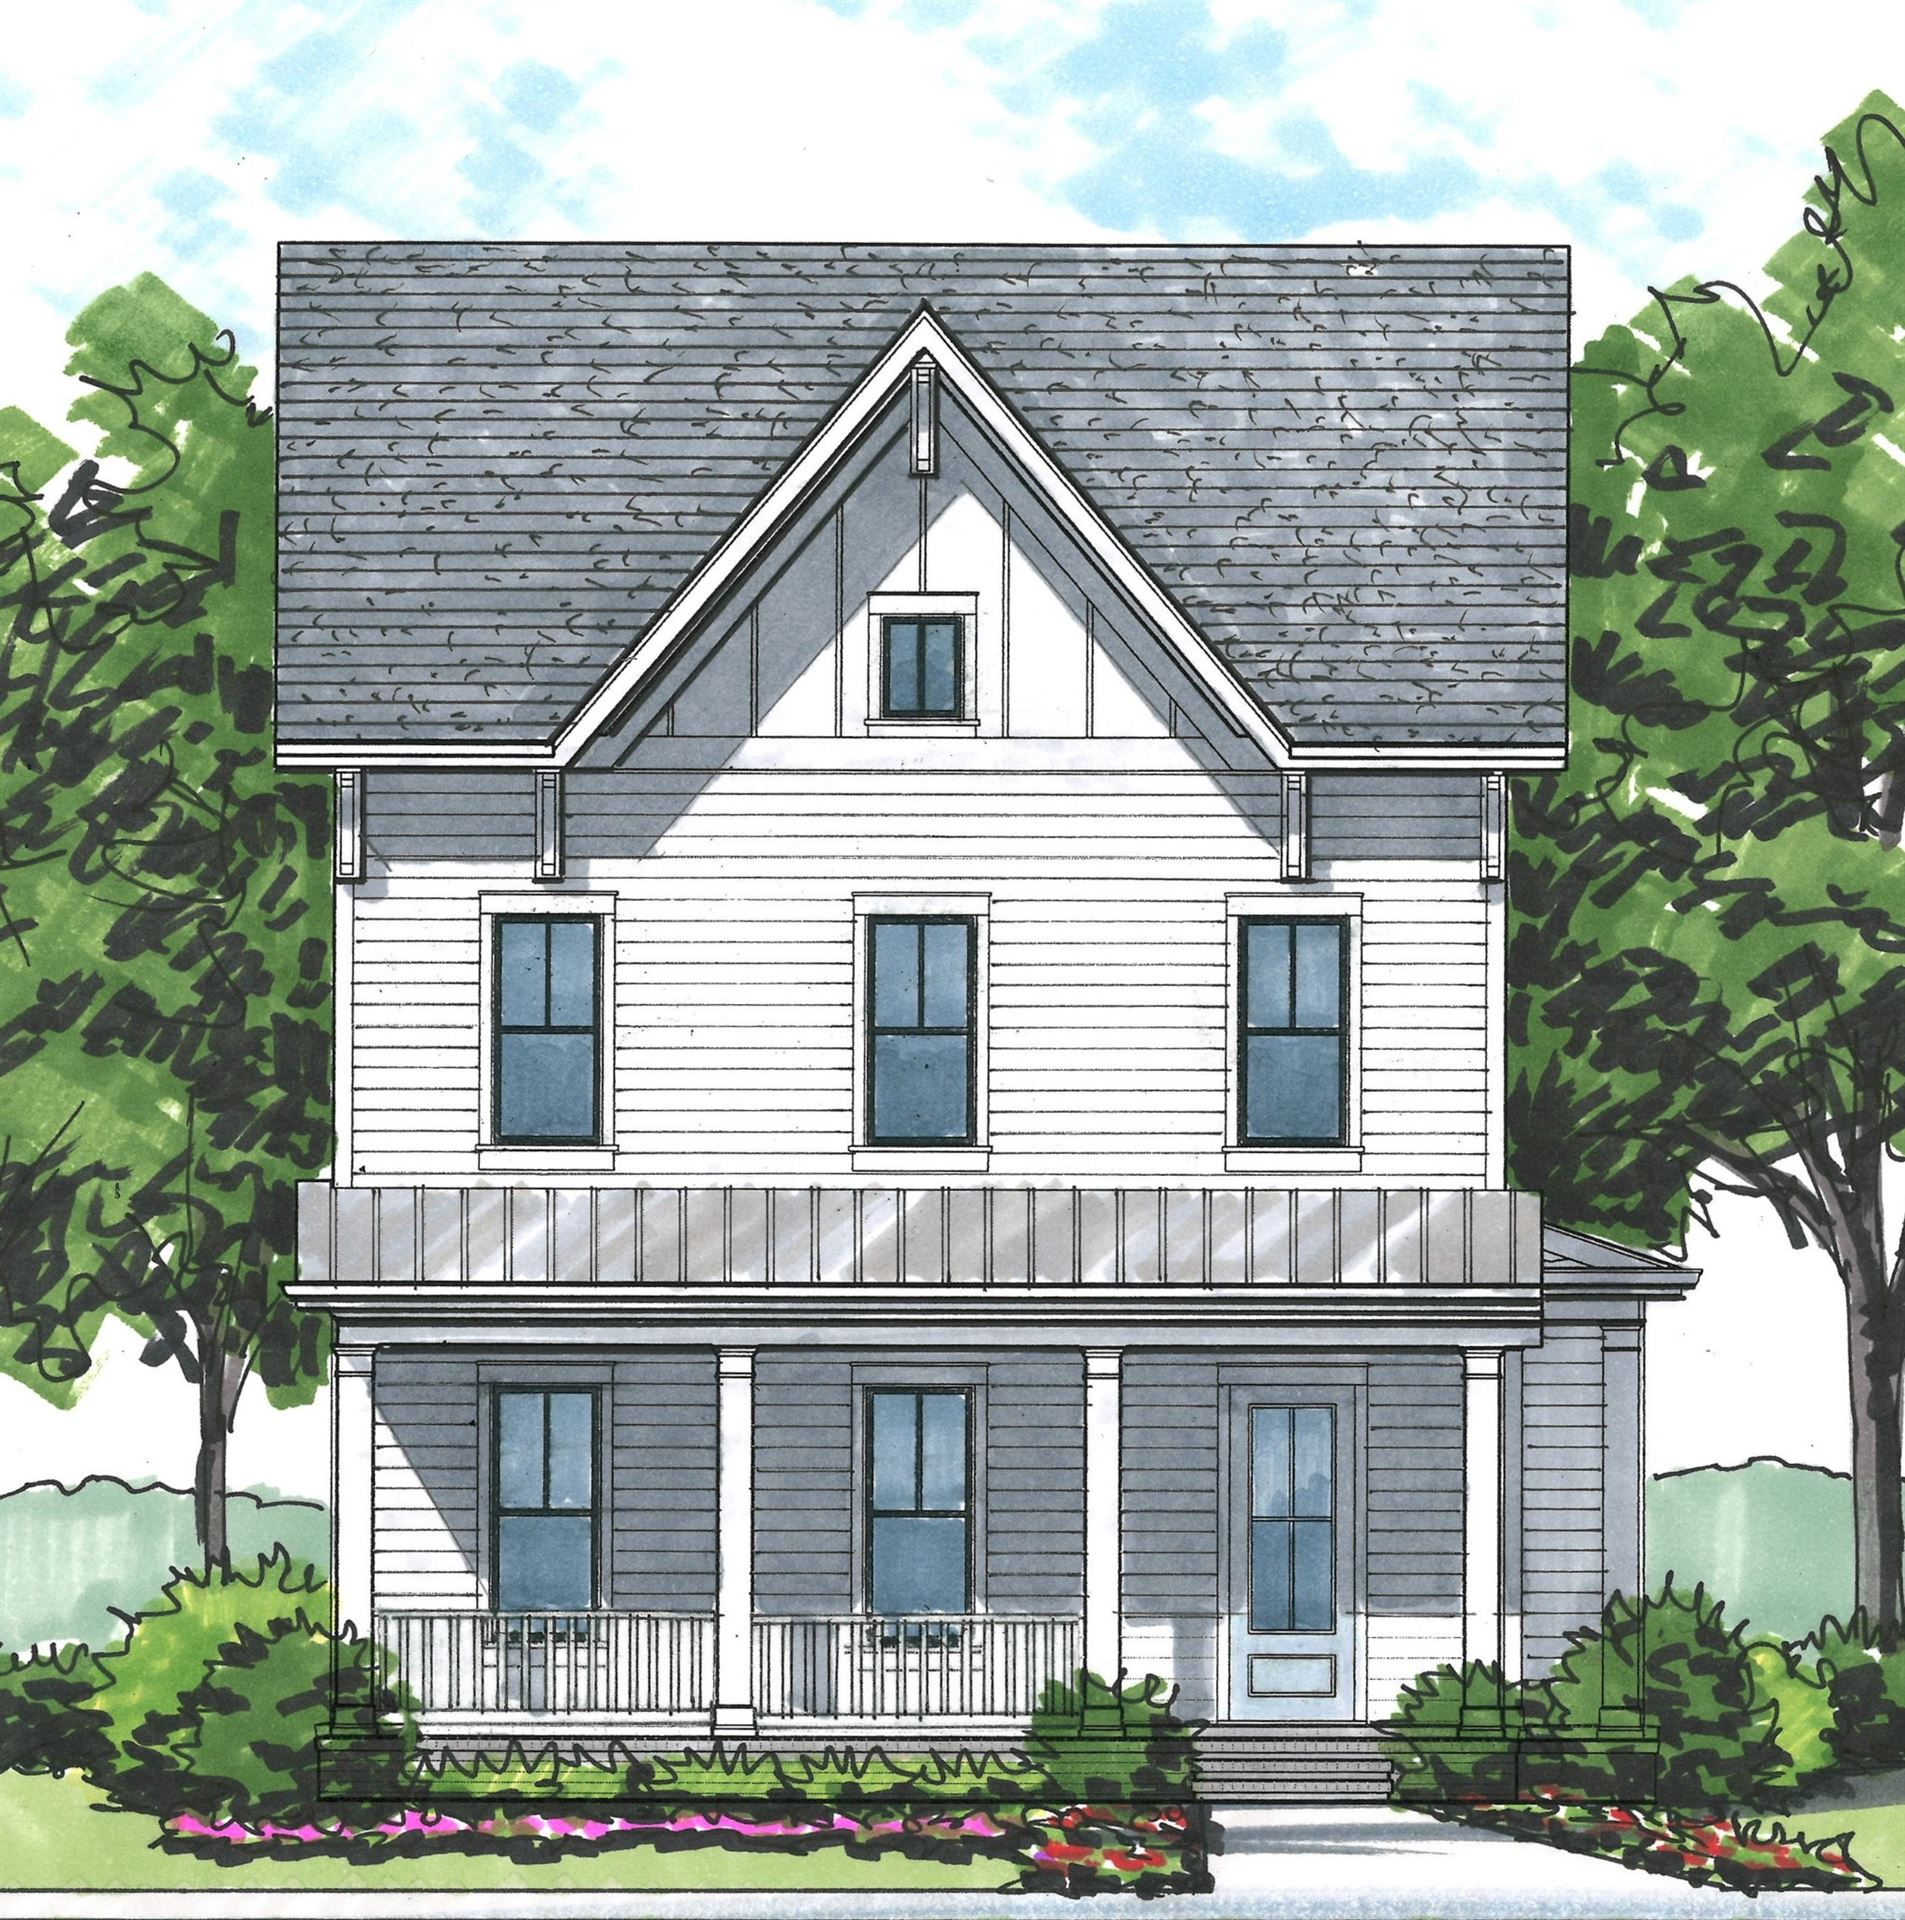 1013 Kathryn Avenue, Lot # 2055, Franklin, TN 37064 - MLS#: 2252141